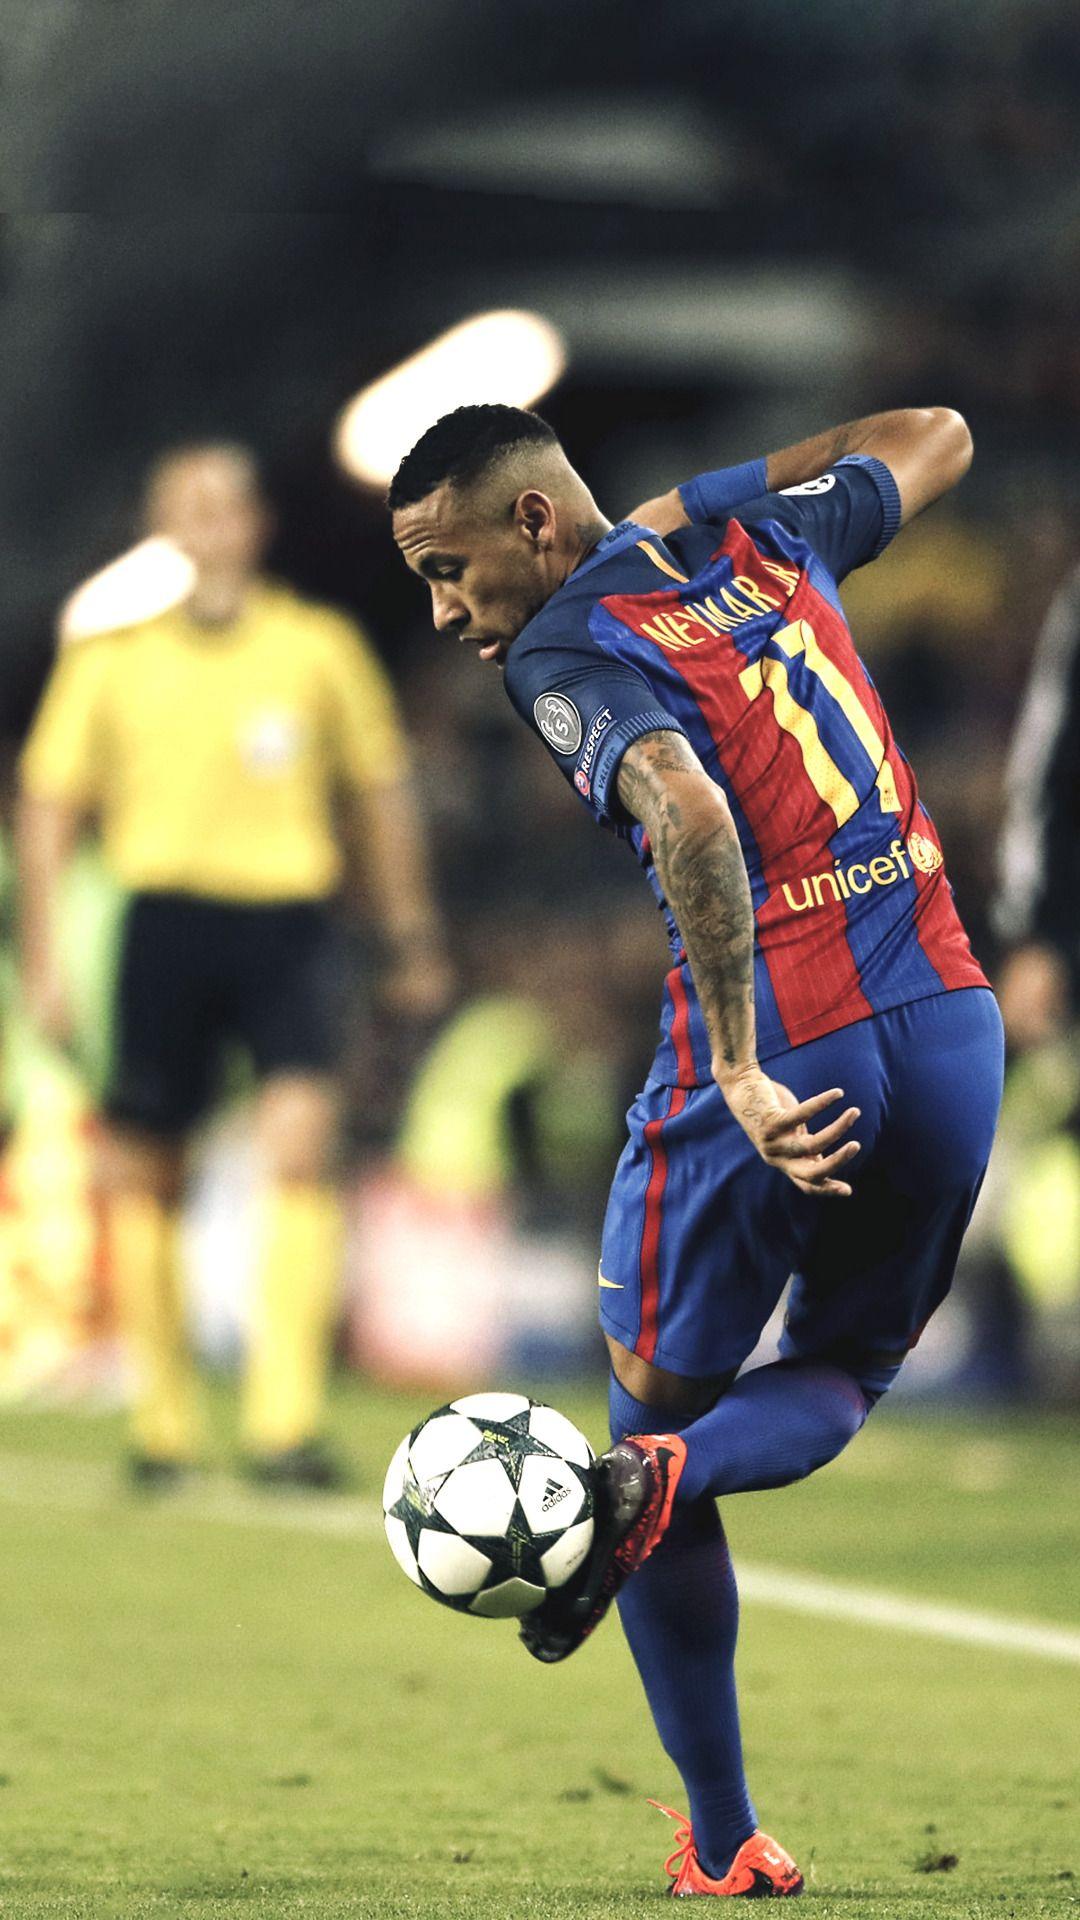 Best 25+ Neymar 2017 ideas on Pinterest | Neymar, Messi best goals and Messi 2017